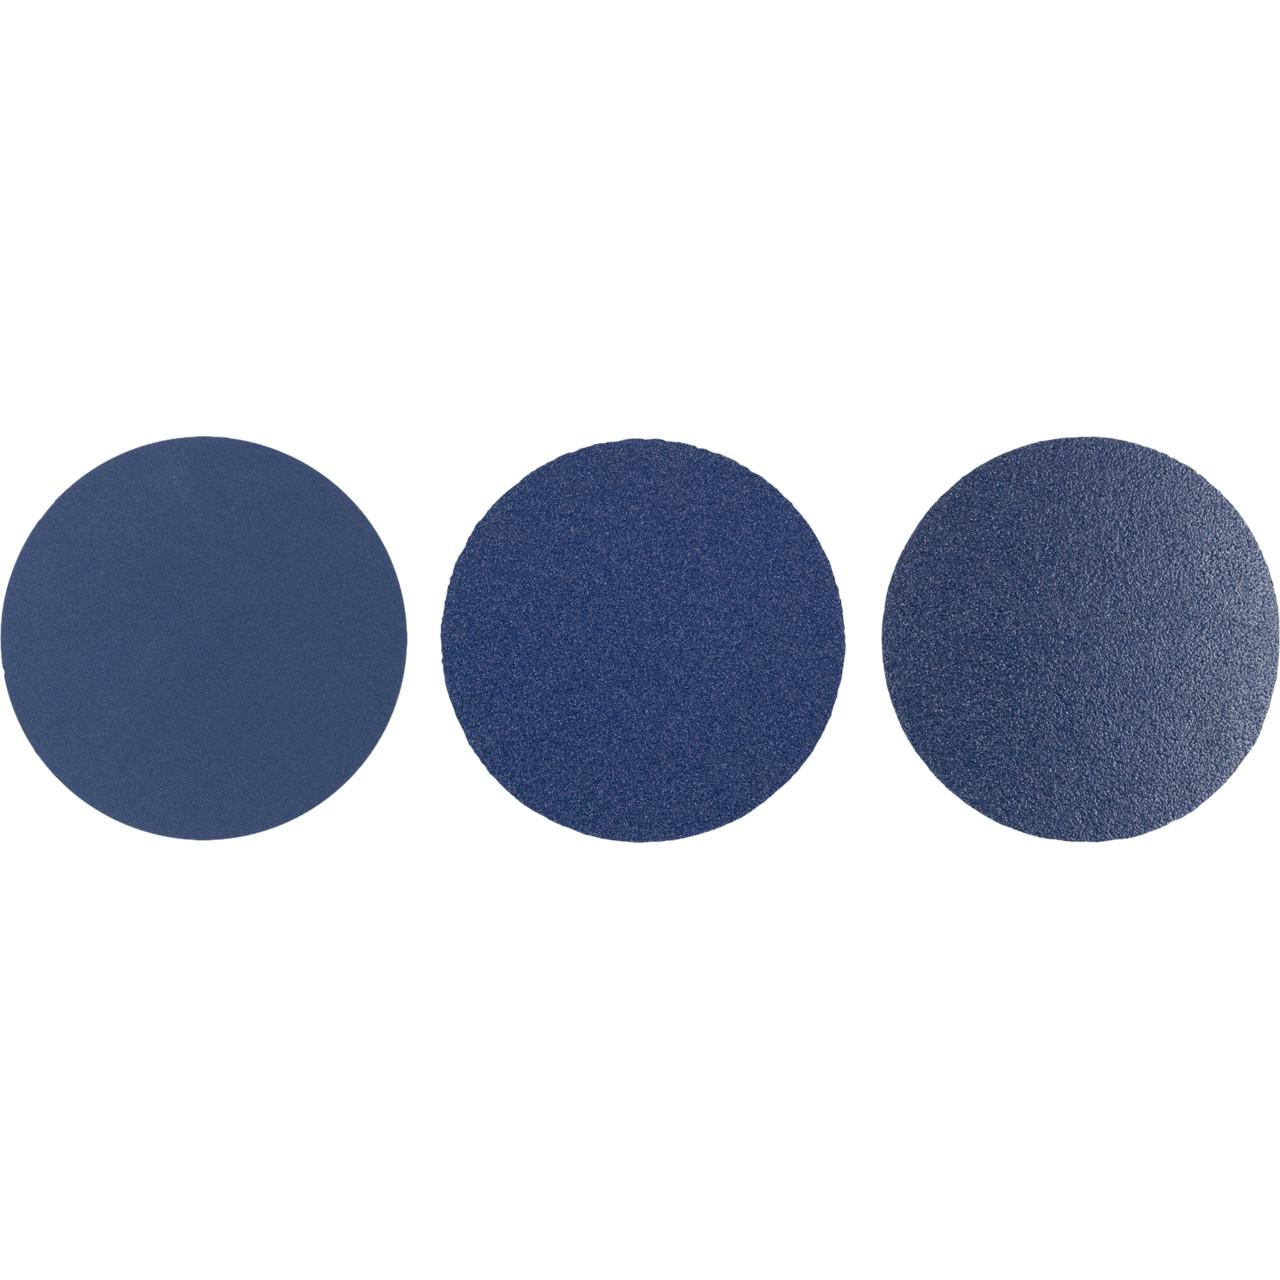 Immagine di TYROLIT Fast Change (TFC) ZA-P45 V* / ZA-P45 P F PREMIUM*** per acciaio, metalli non ferrosi, materiali composti e gel coat